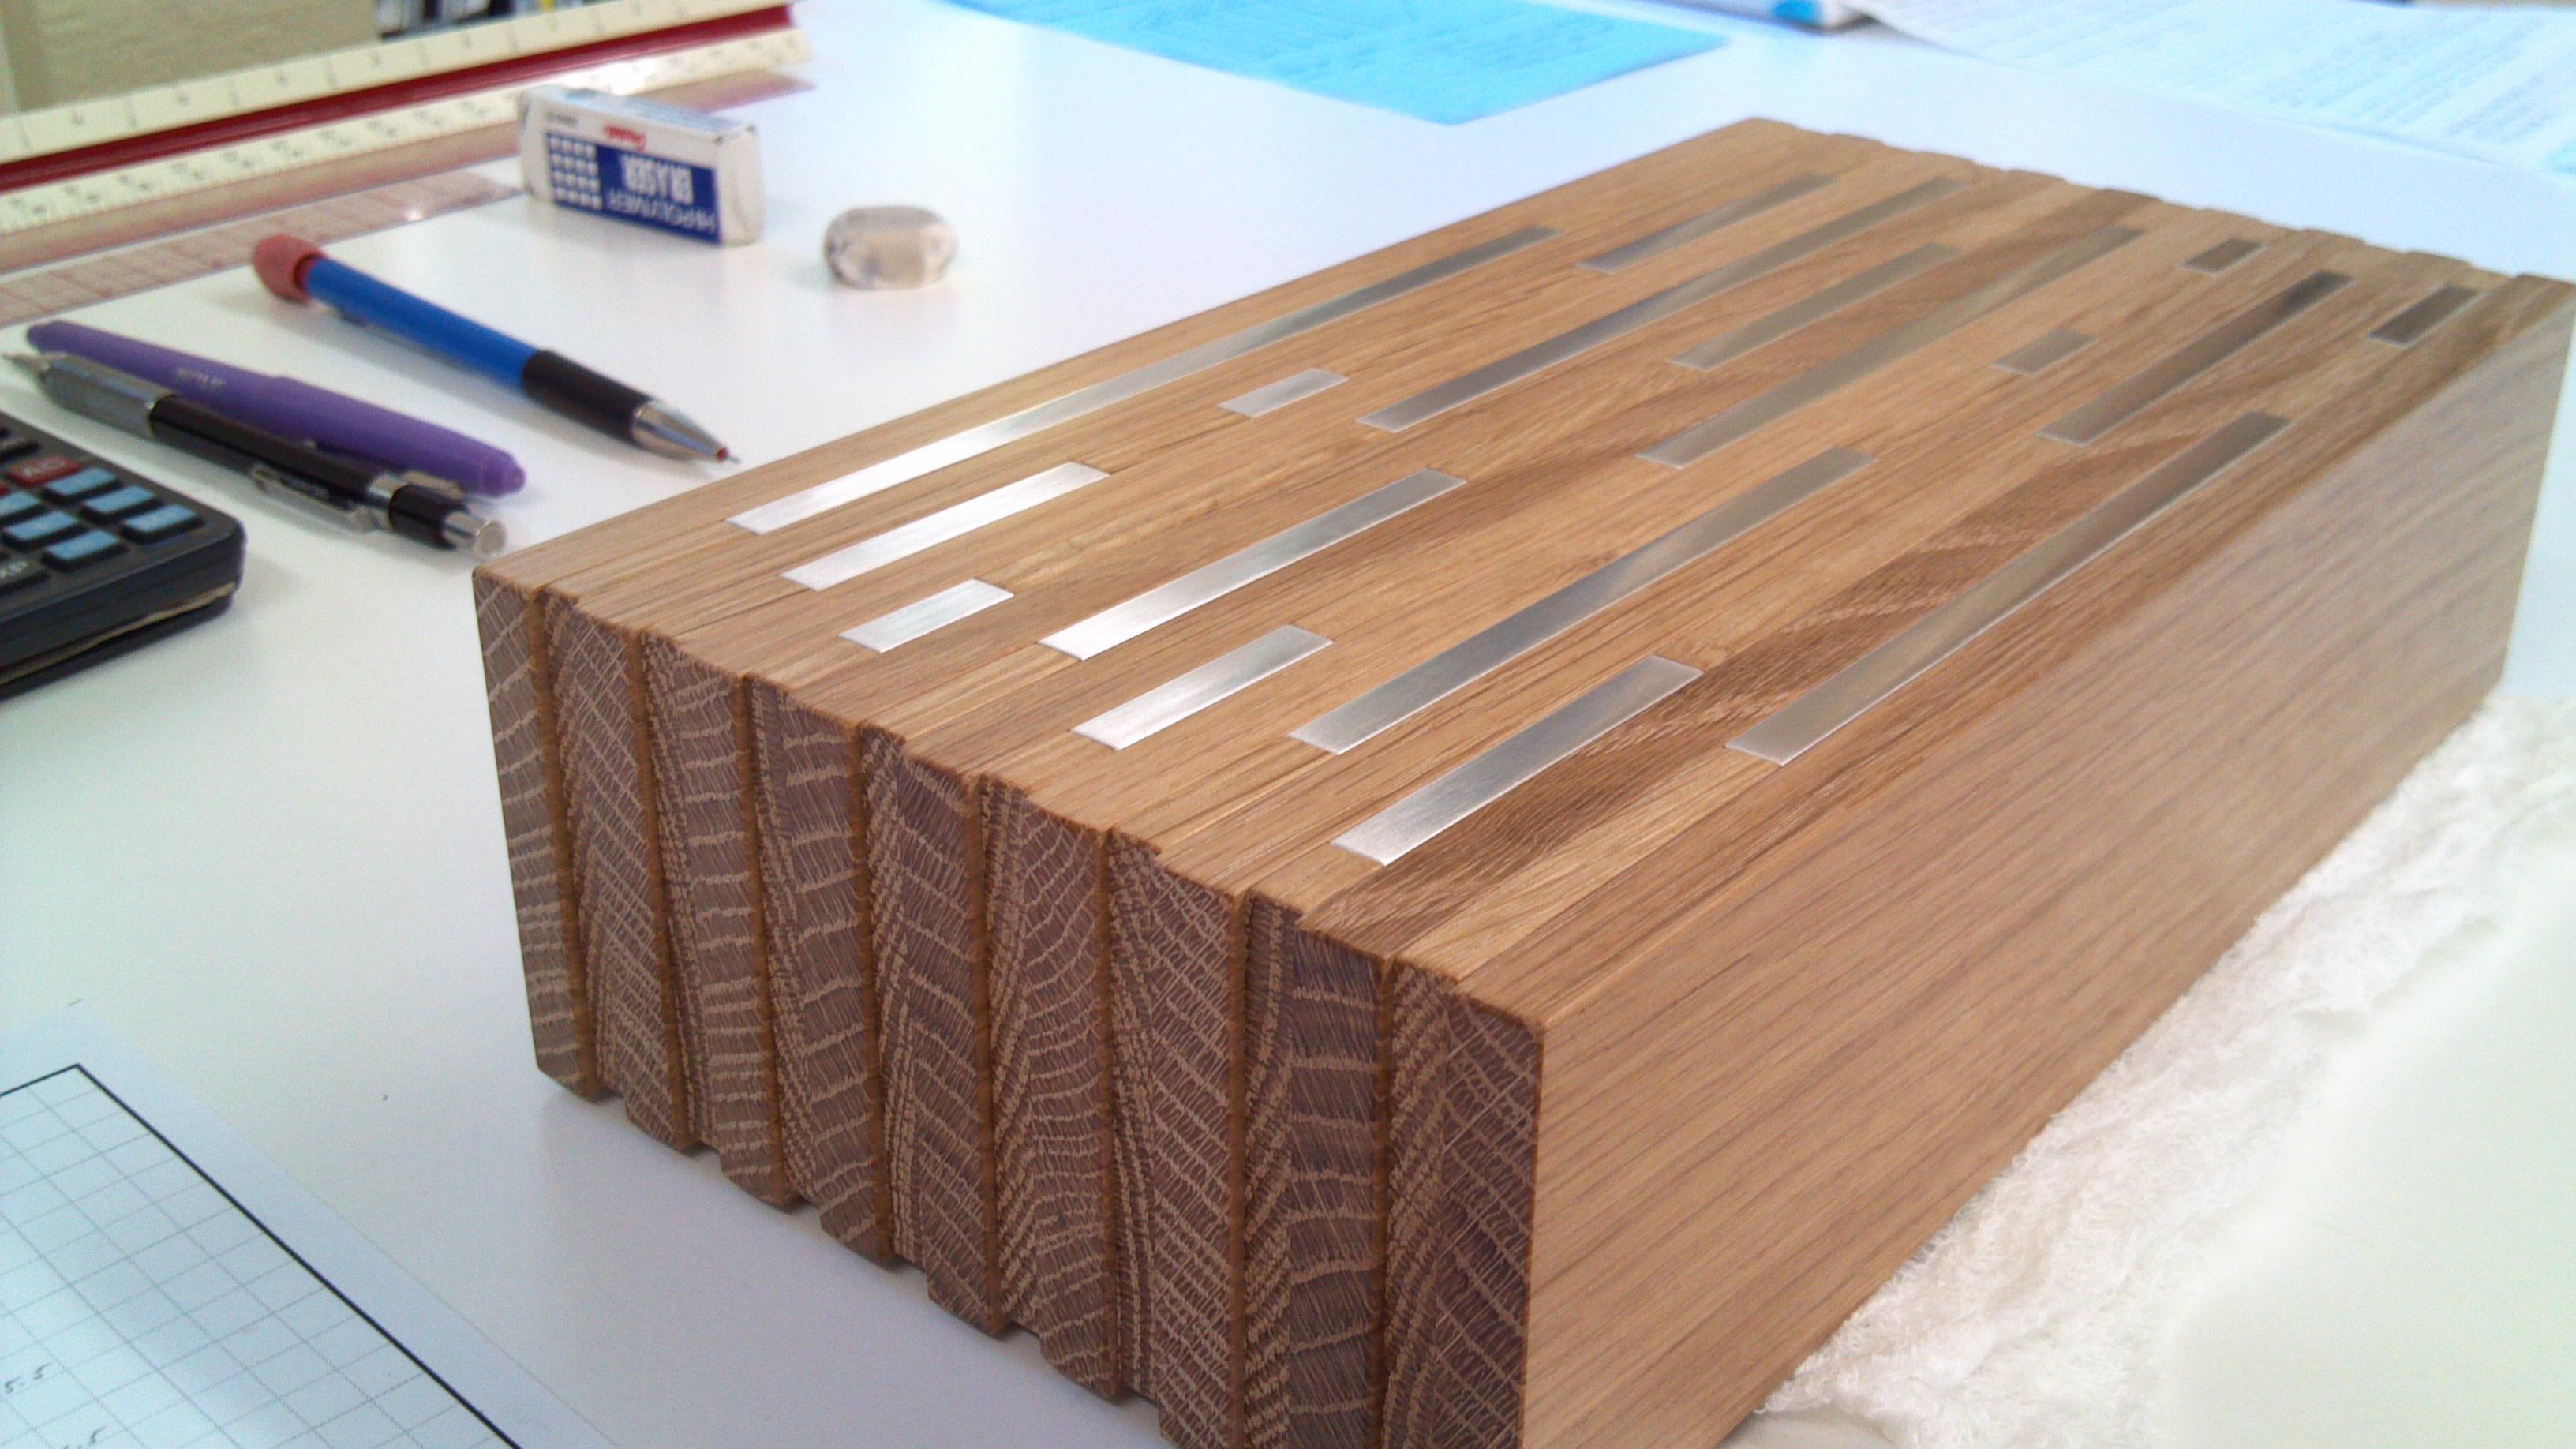 ... table and bar top - solid vs veneer - WOODWEB